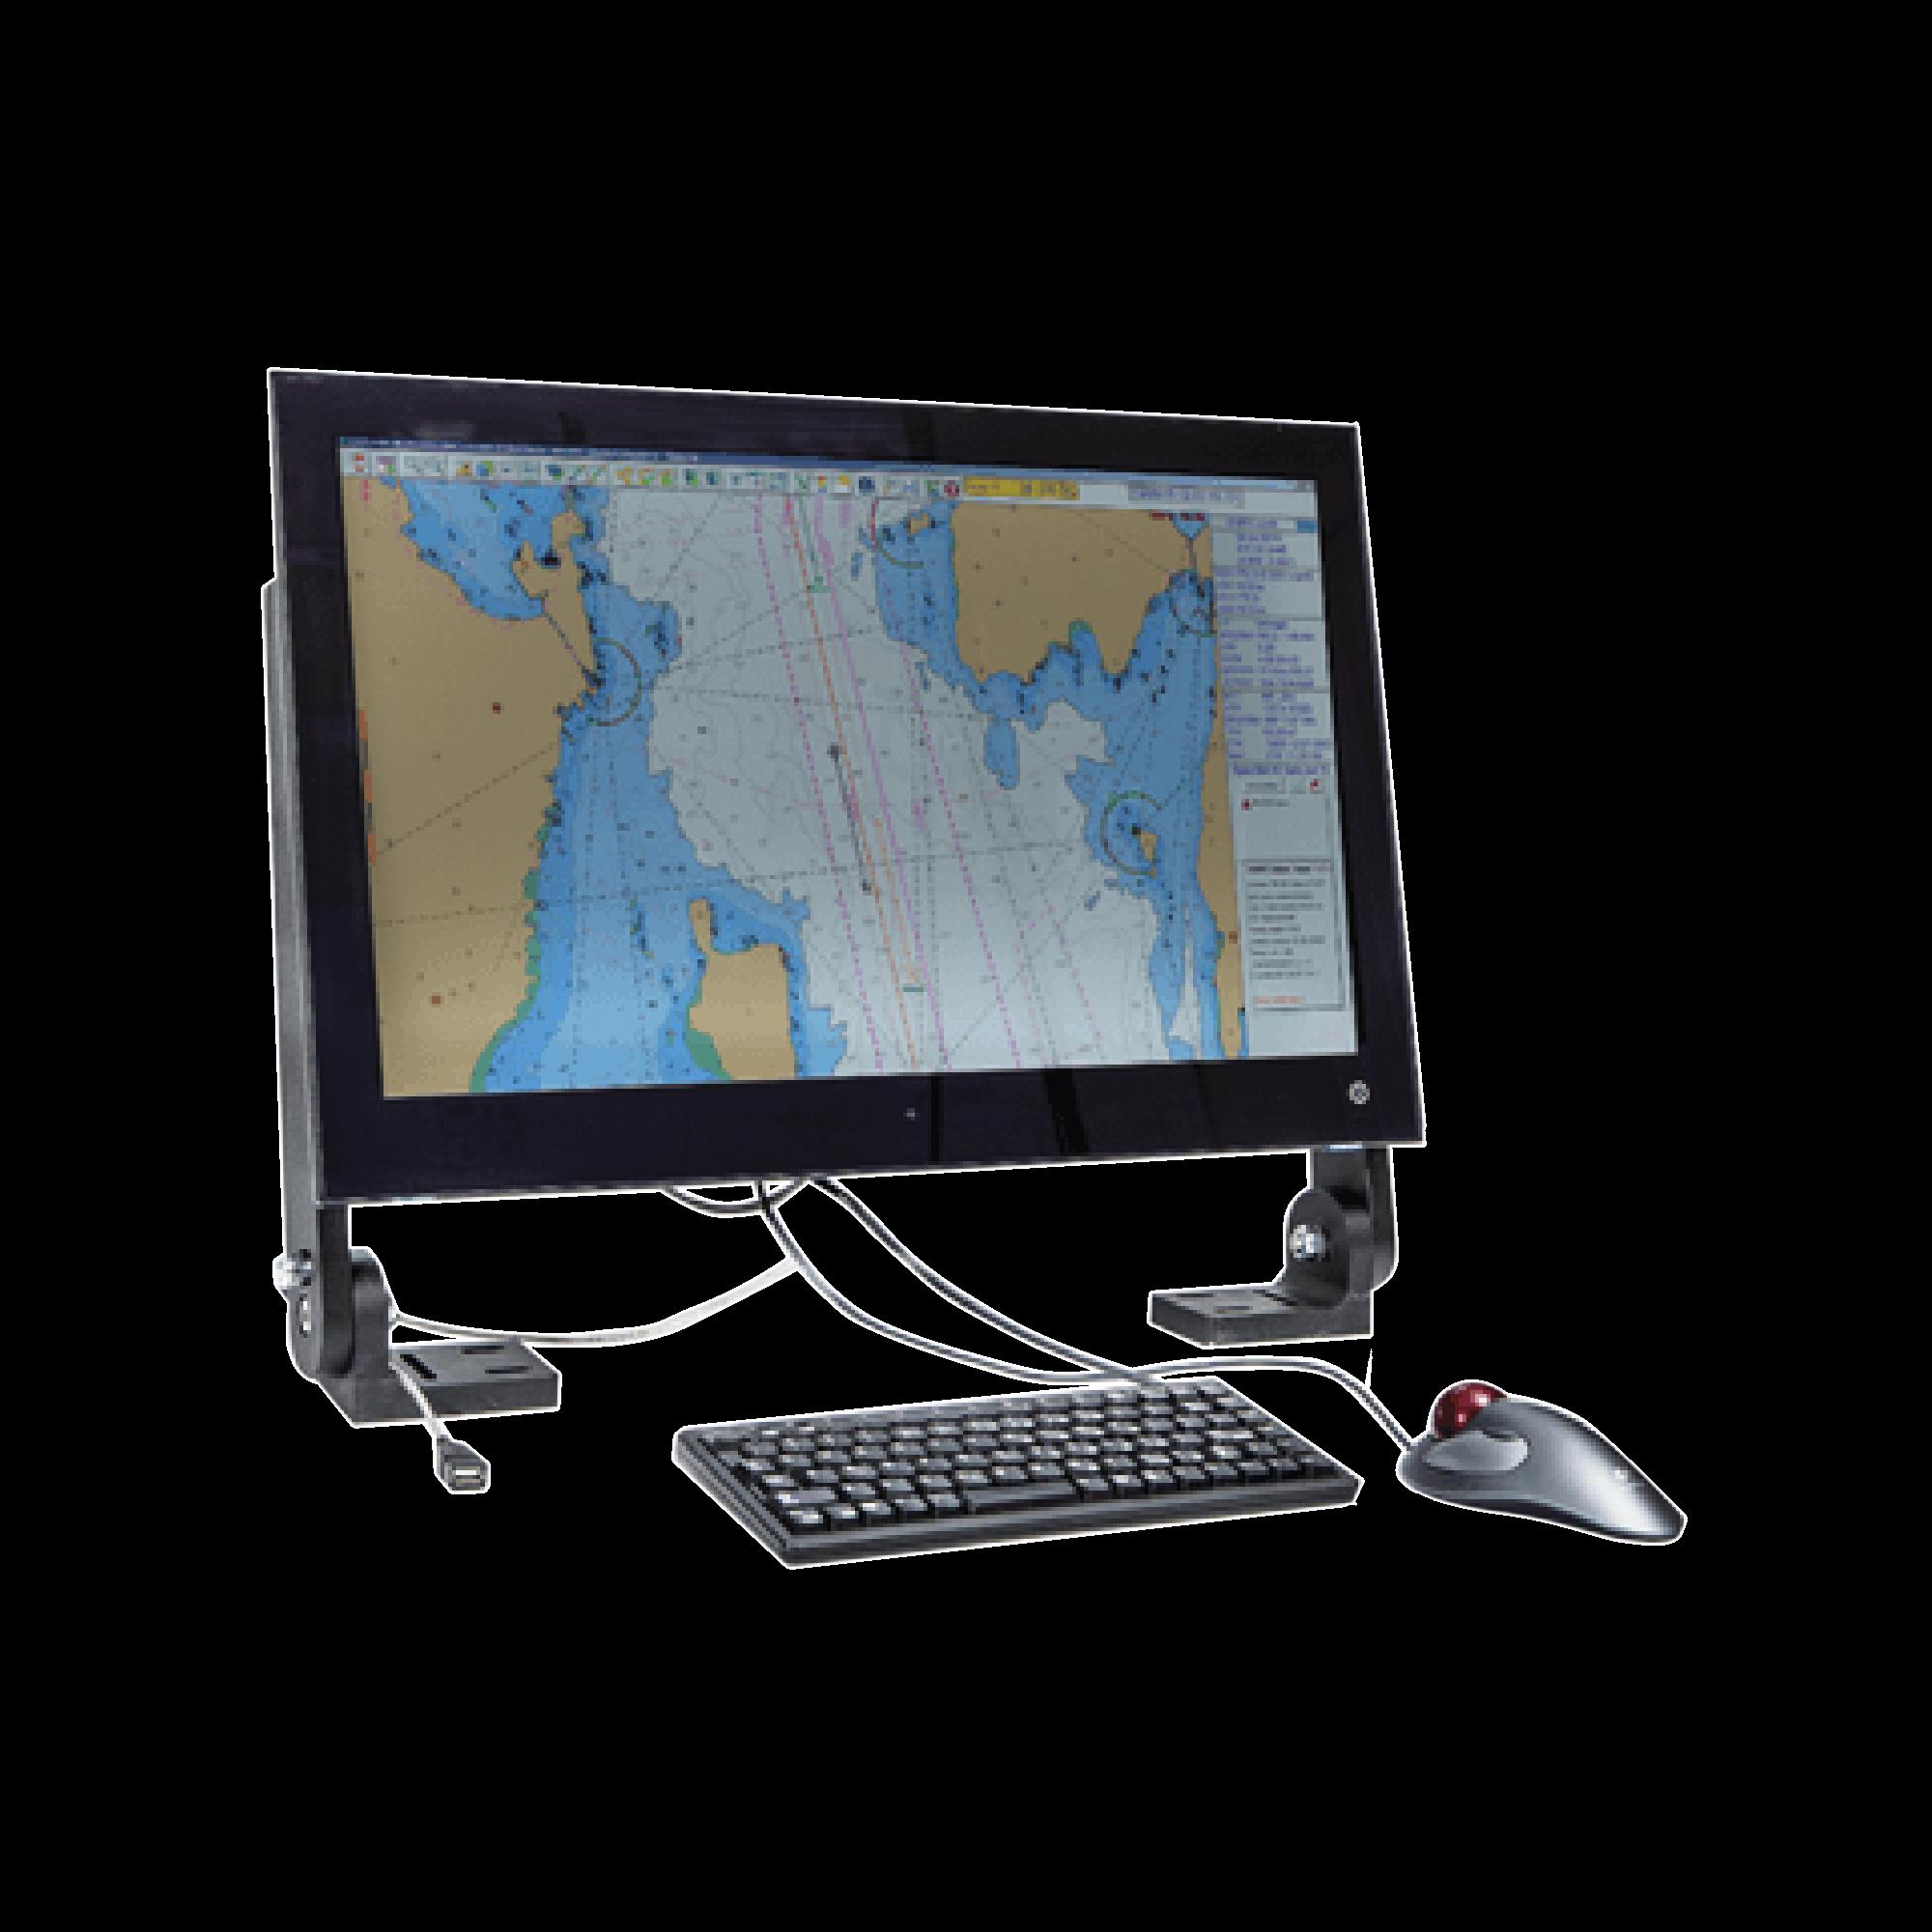 Sistema SIMRAD Maris ECDIS900 MK15 con pantalla de 24